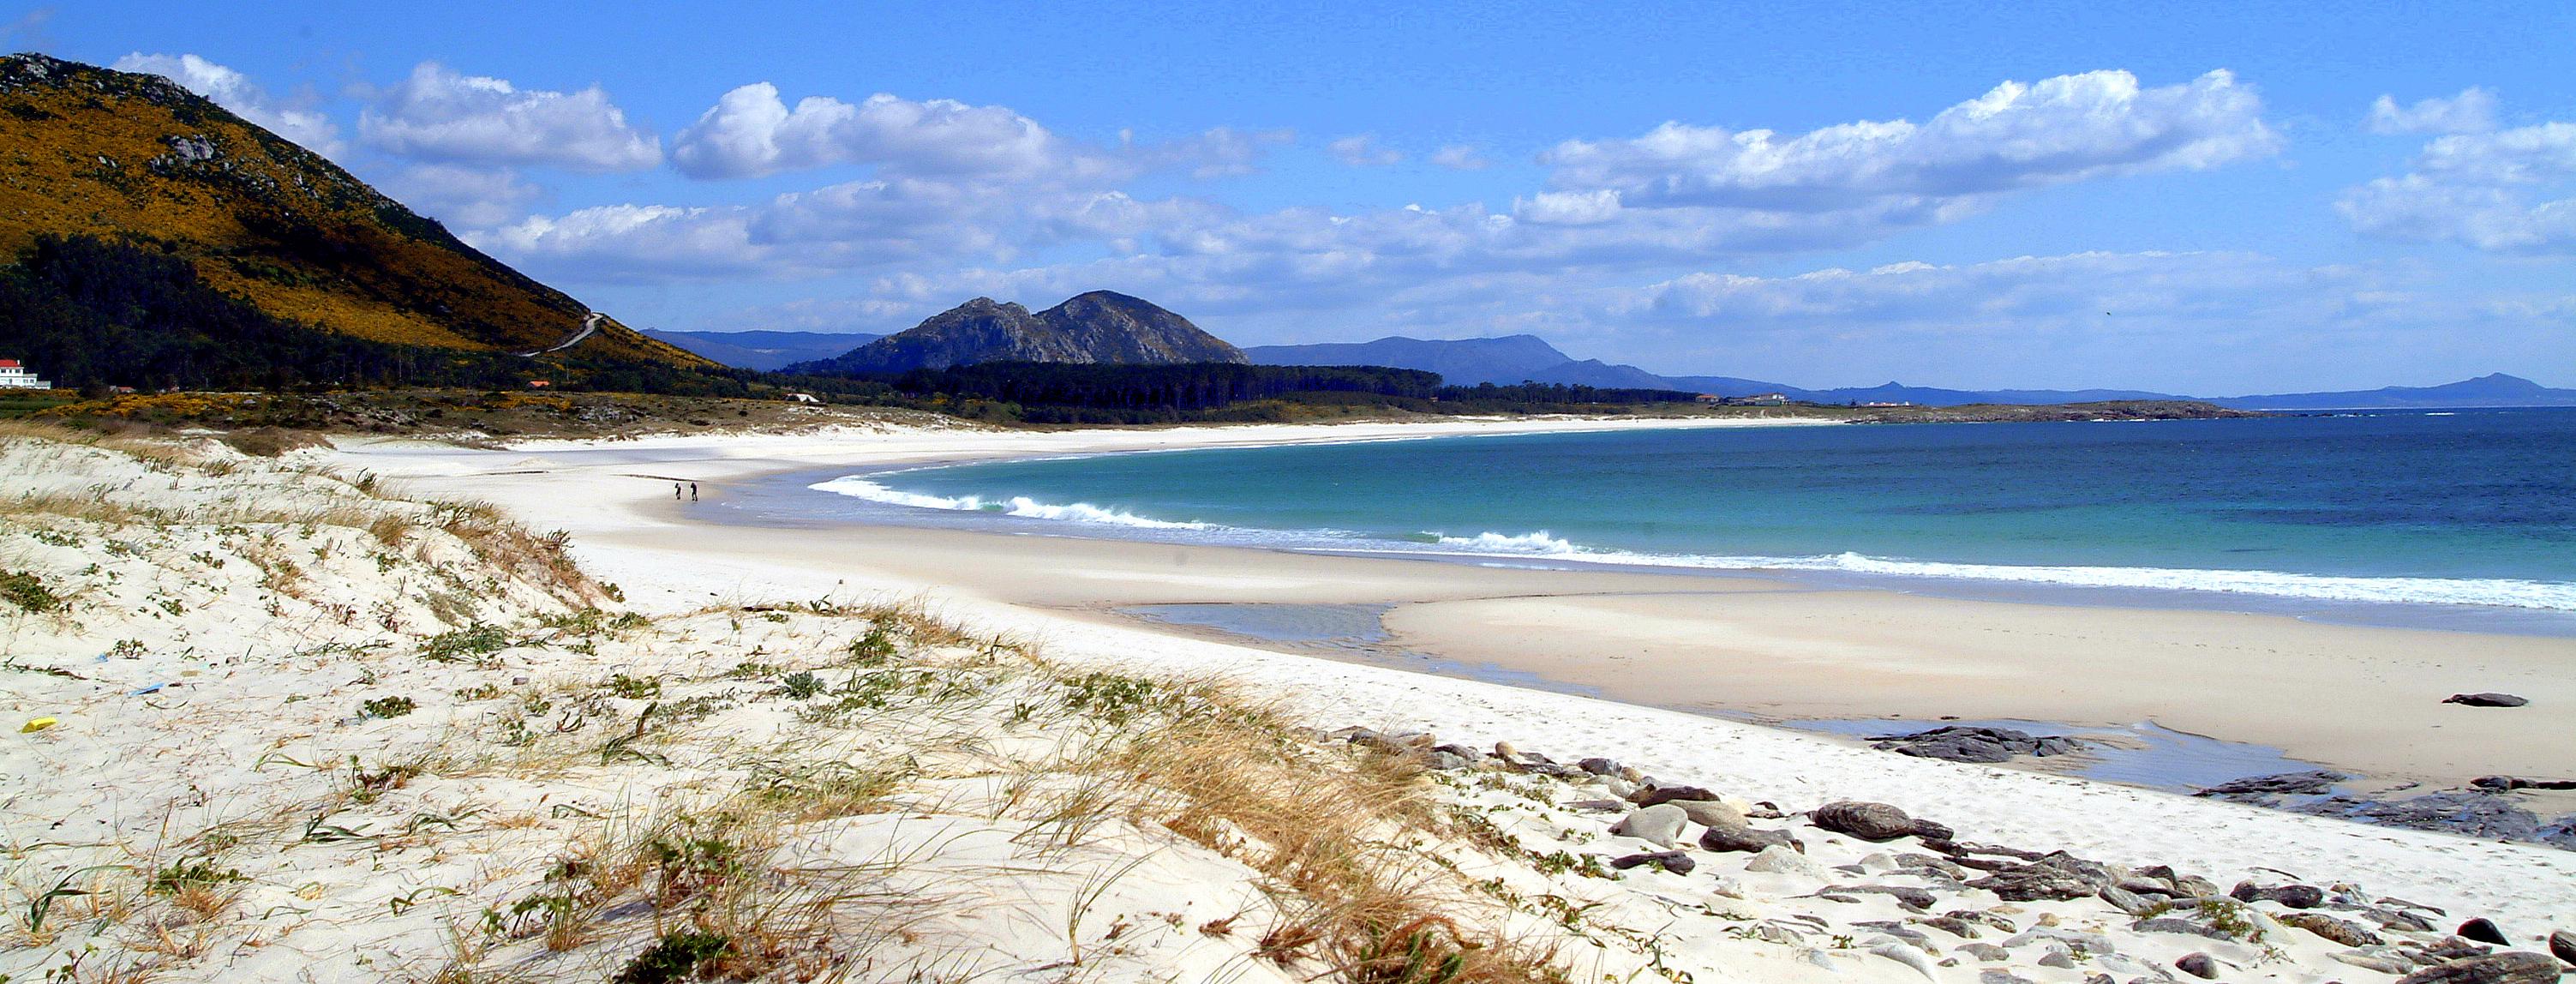 Foto playa Area Maior / Louro. Ría de Muros - Praia de Monte Louro